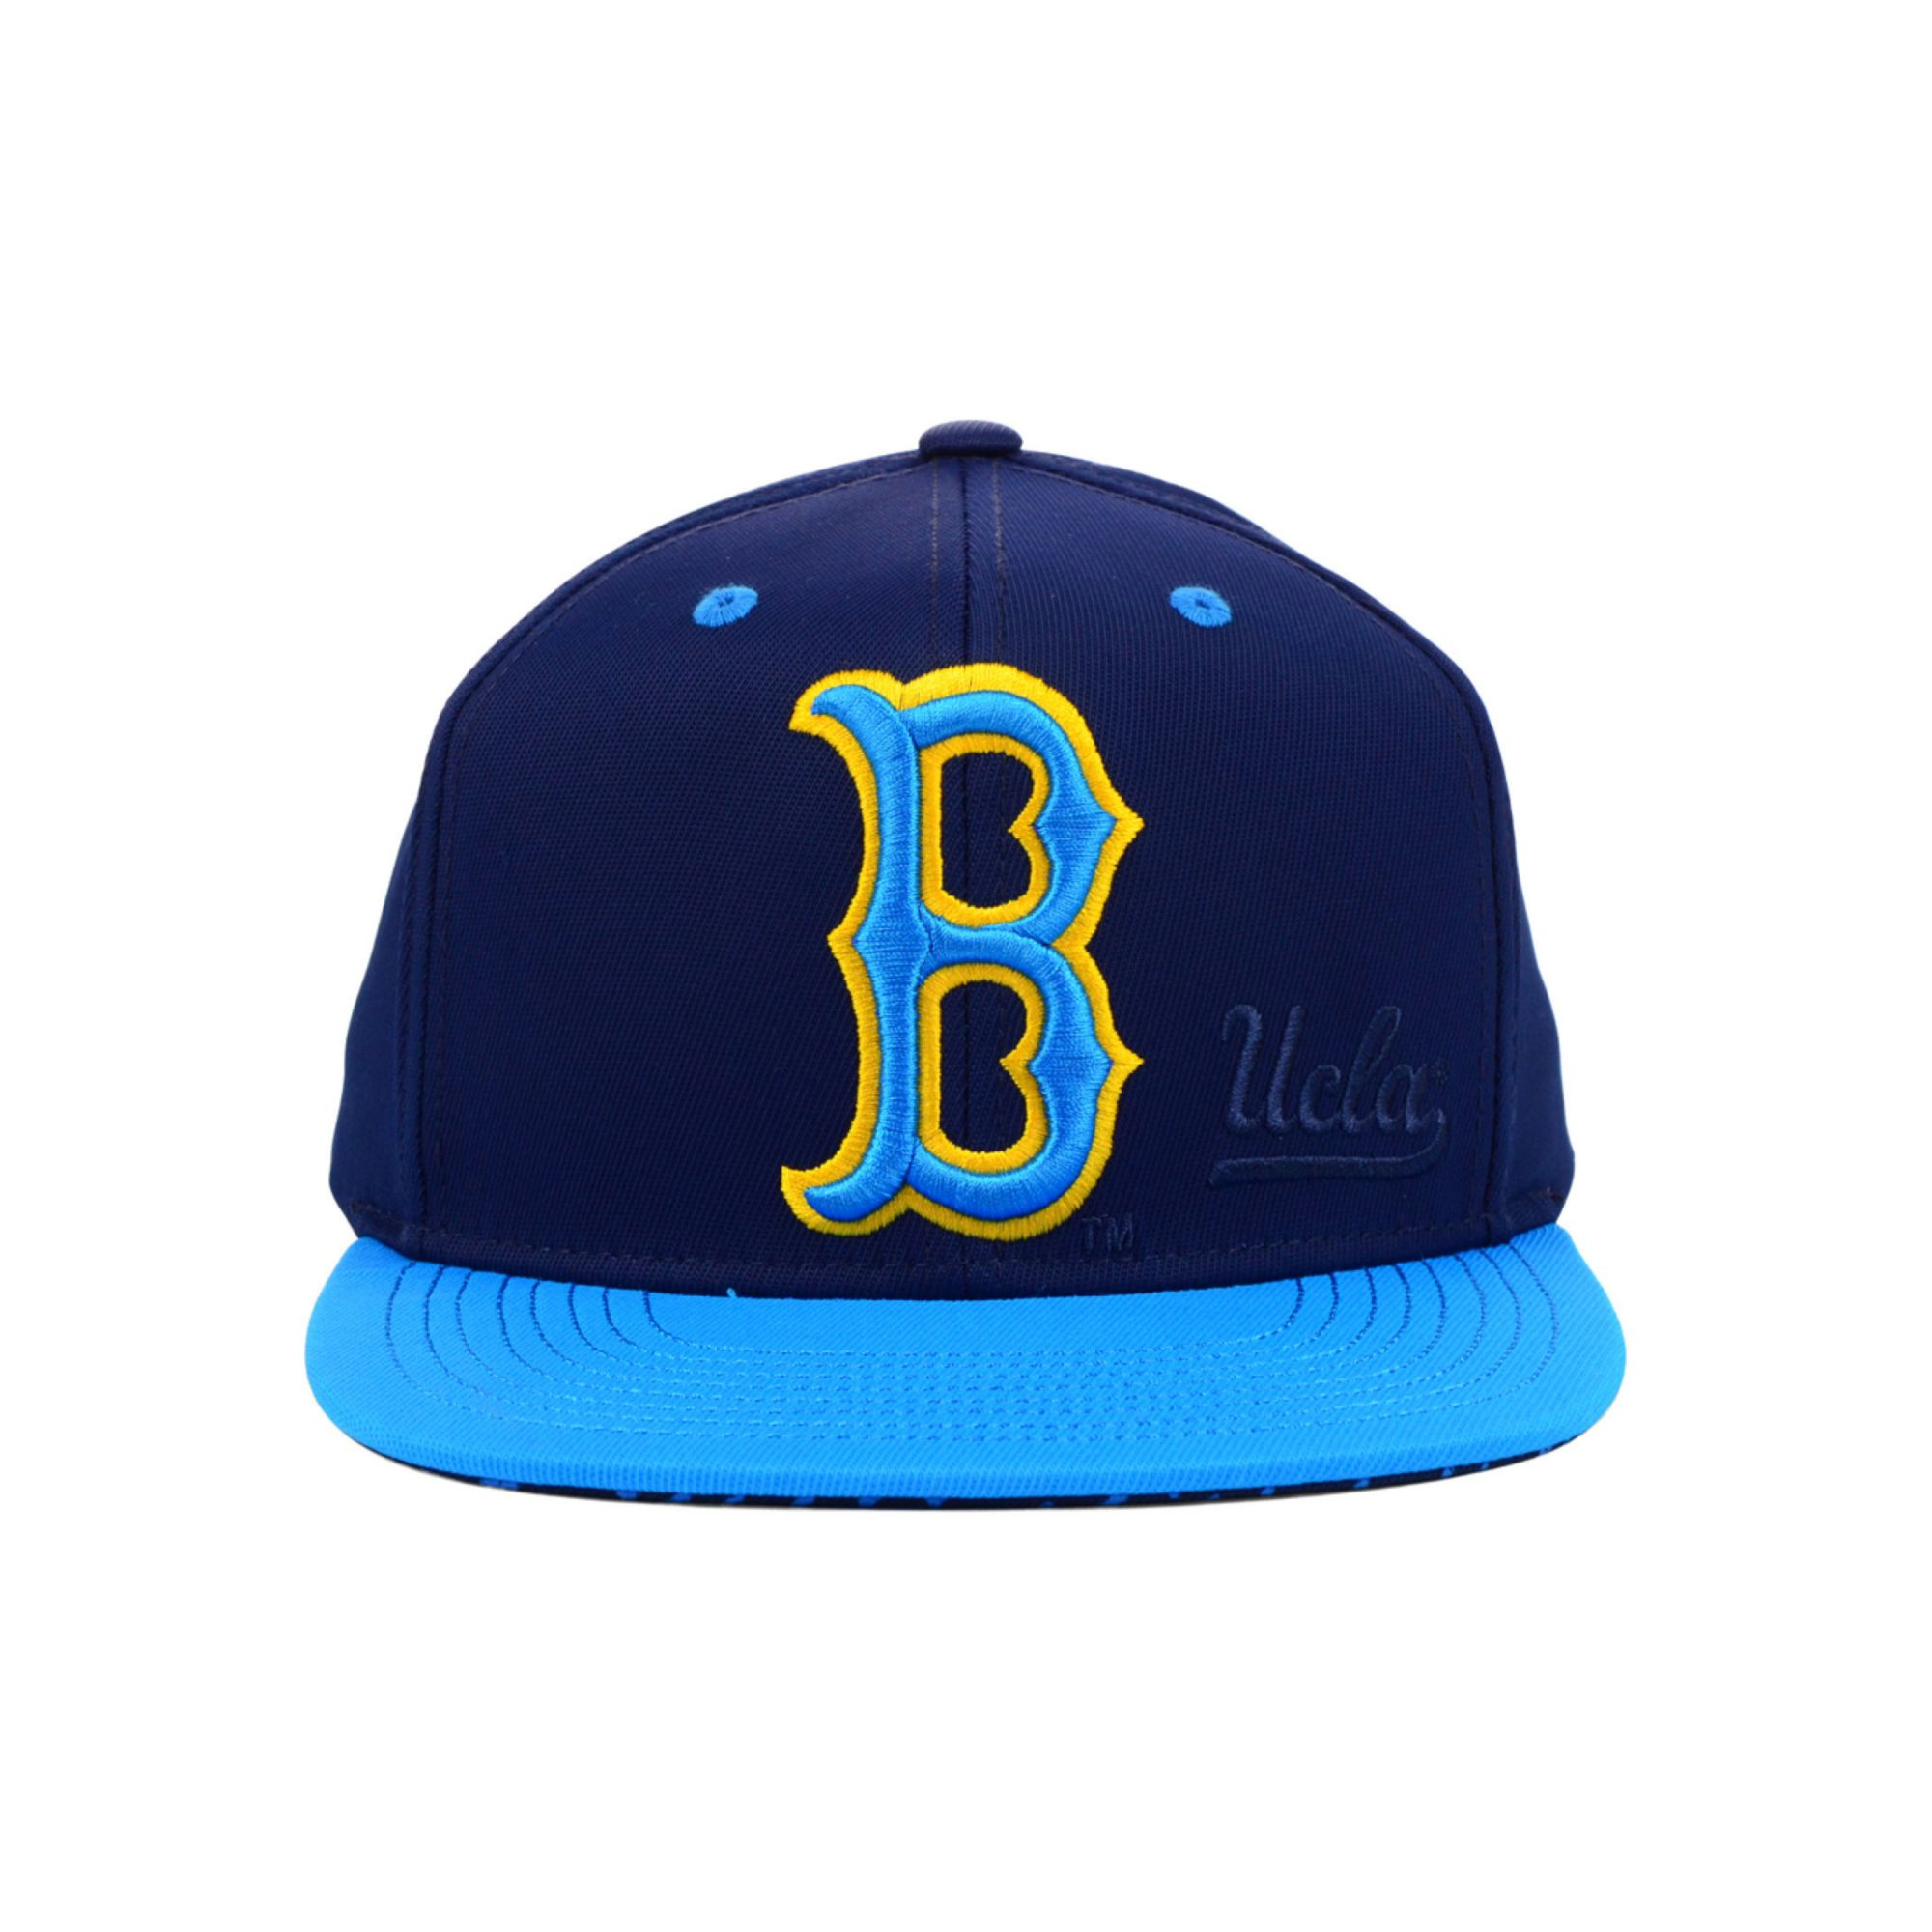 9da9d1df9b0 Lyst - adidas Ucla Bruins Mm Snapback Cap in Blue for Men